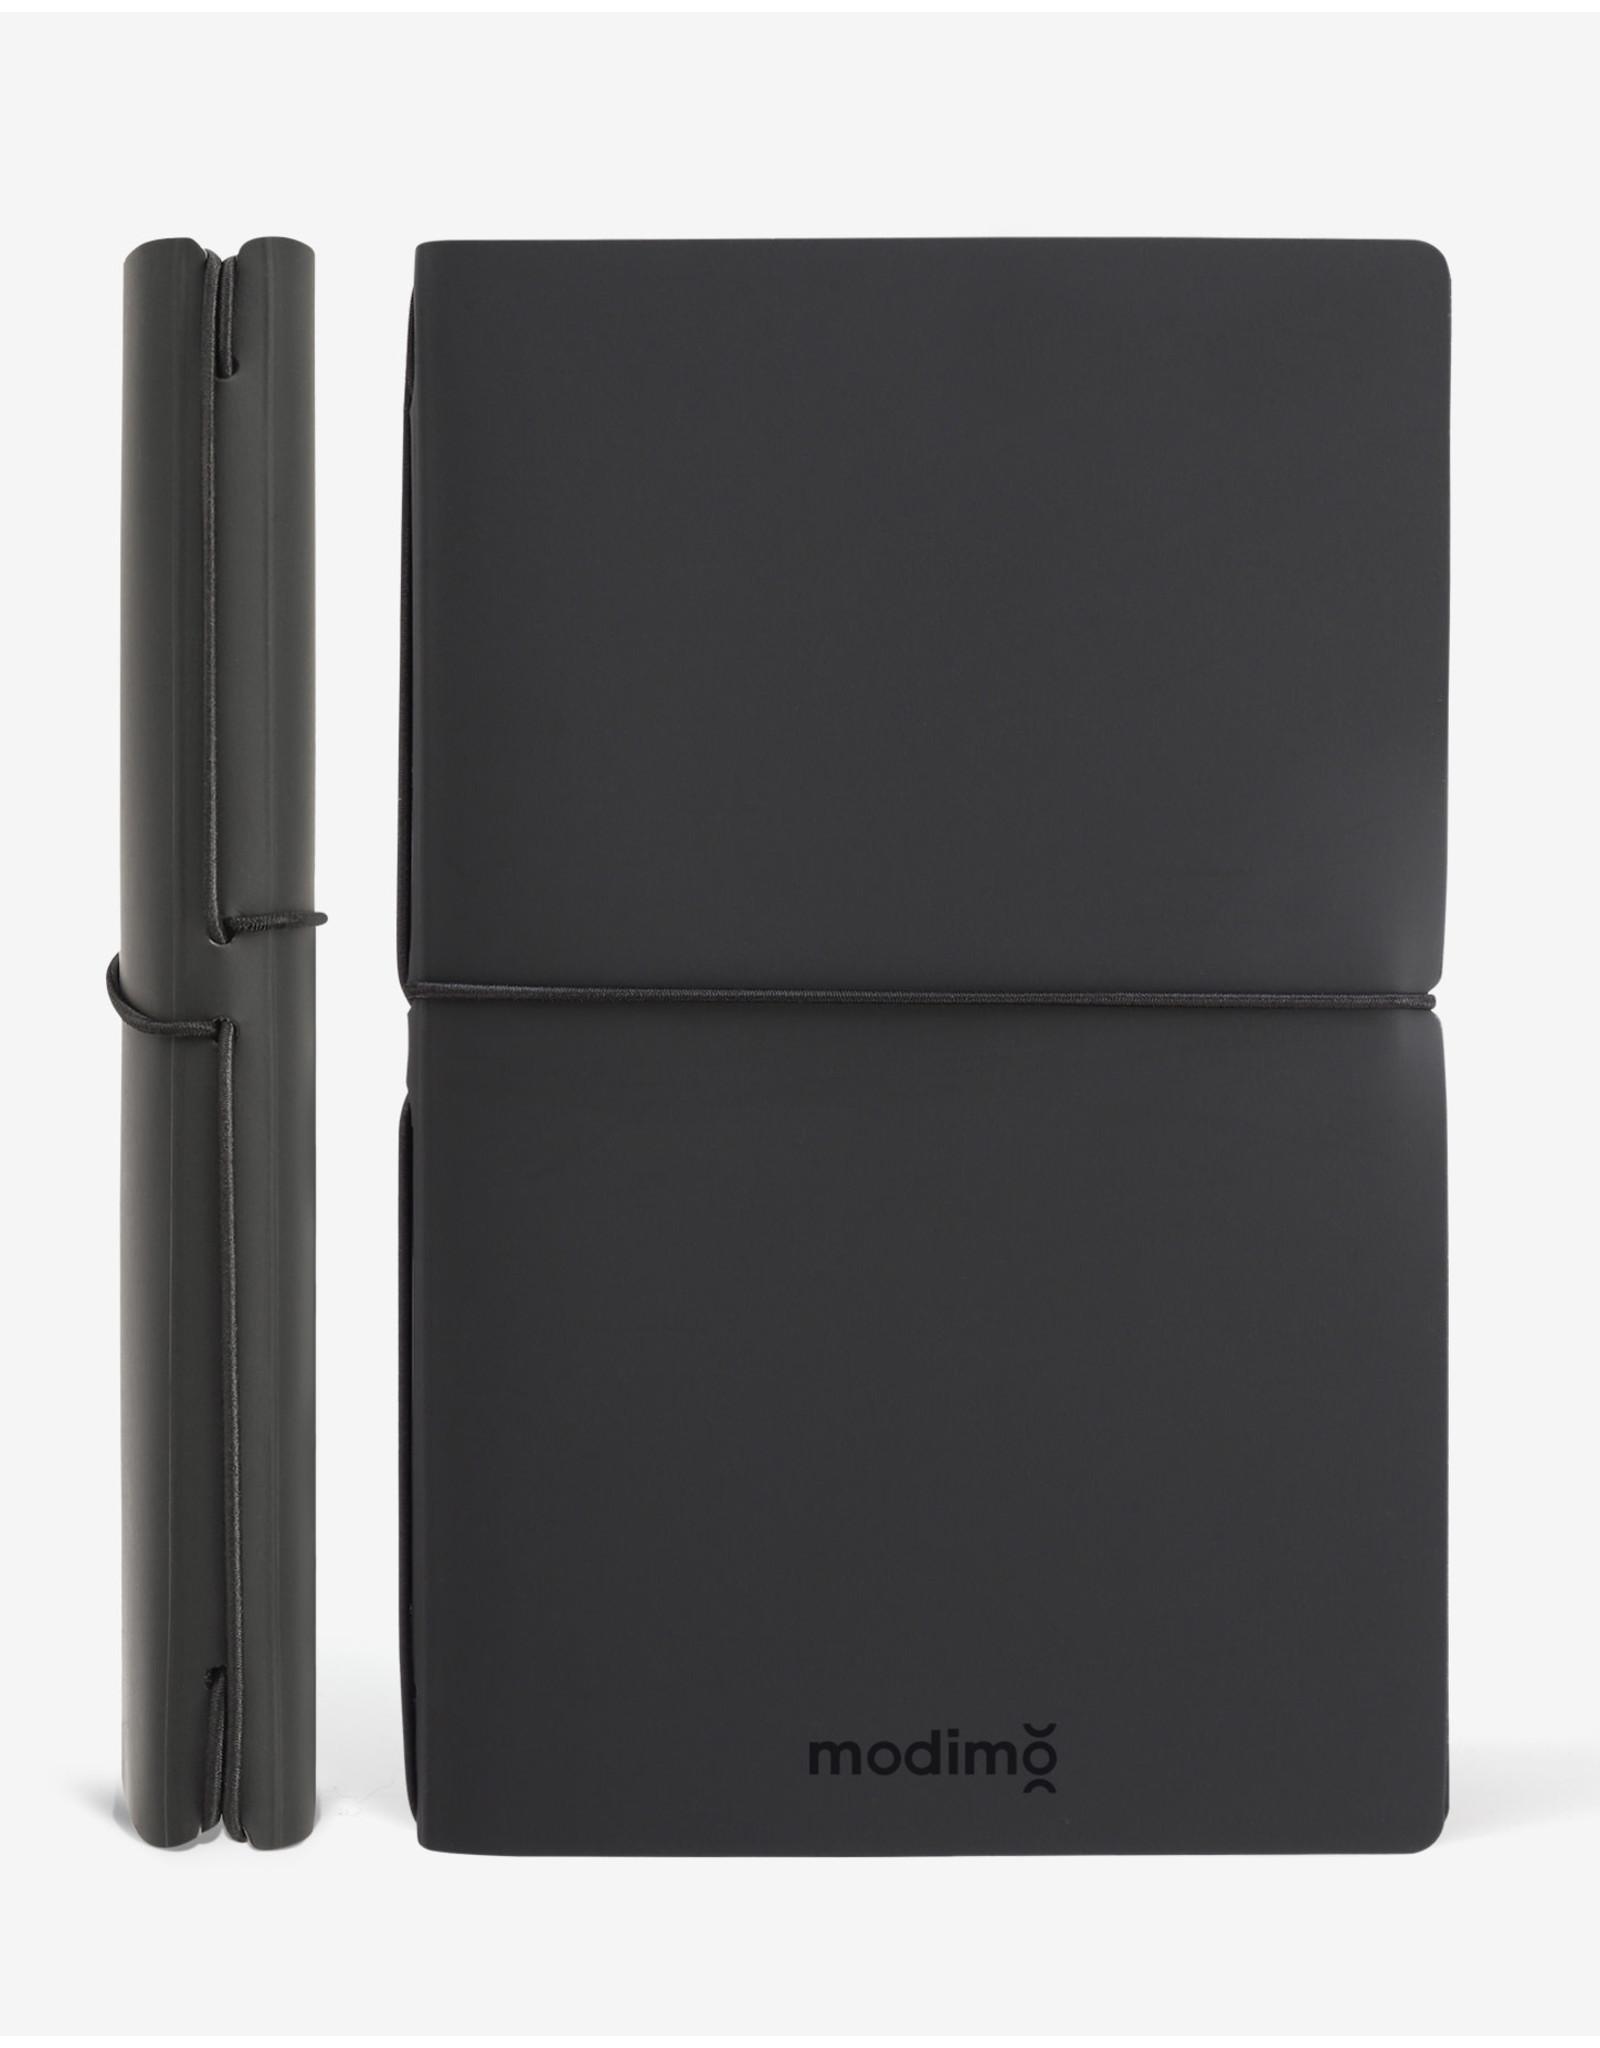 Modimo Bullet journal Black - My plan - White - 13 x 21 cm - Flexible regenerated leather